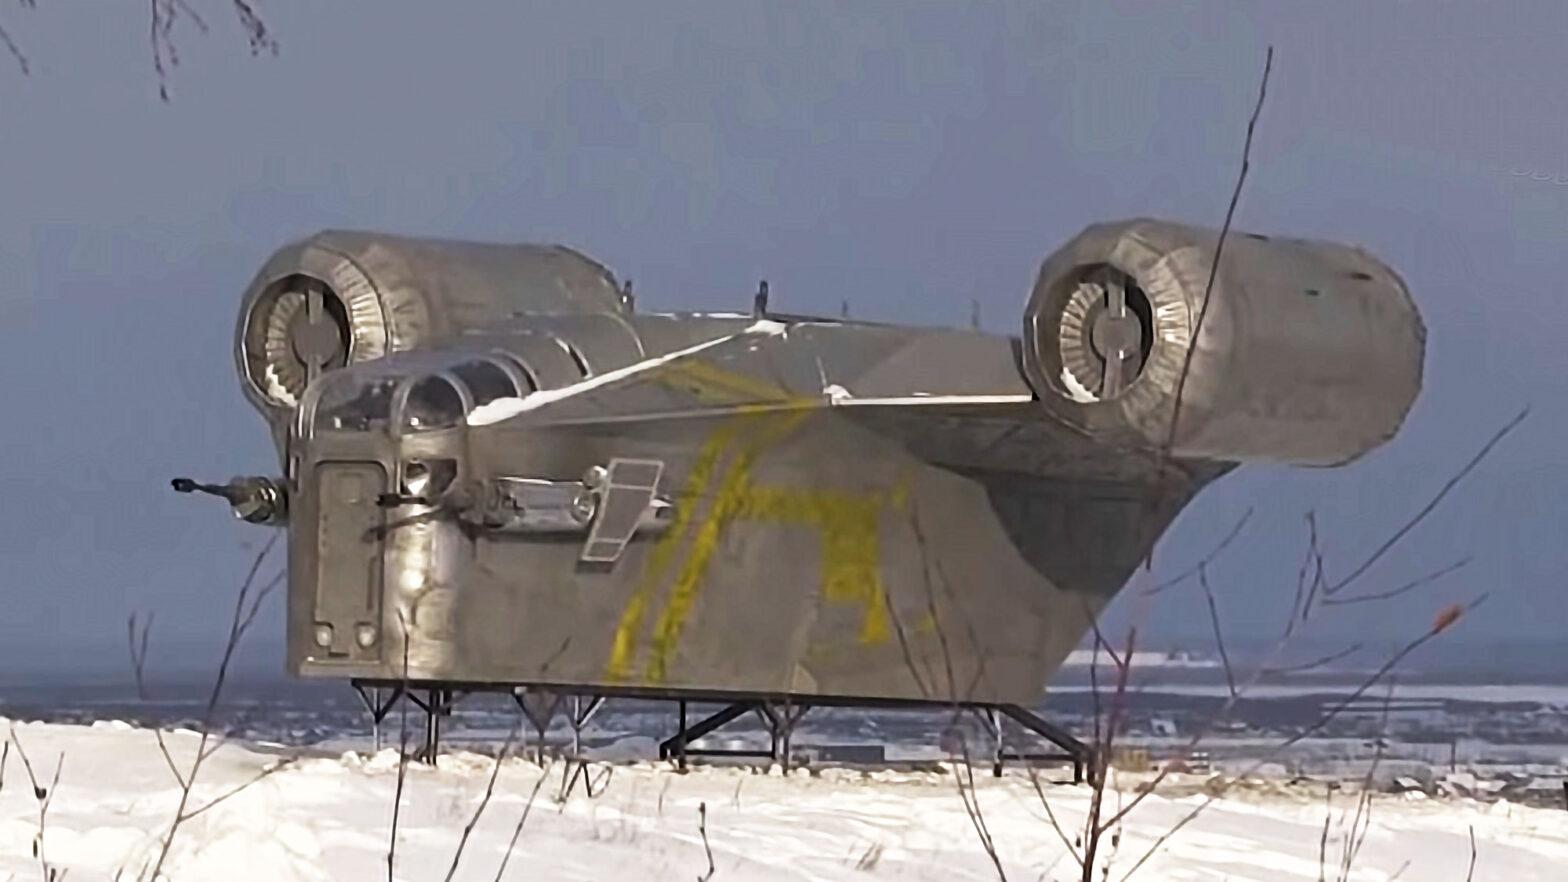 The Mandalorian Razor Crest Replica Siberia